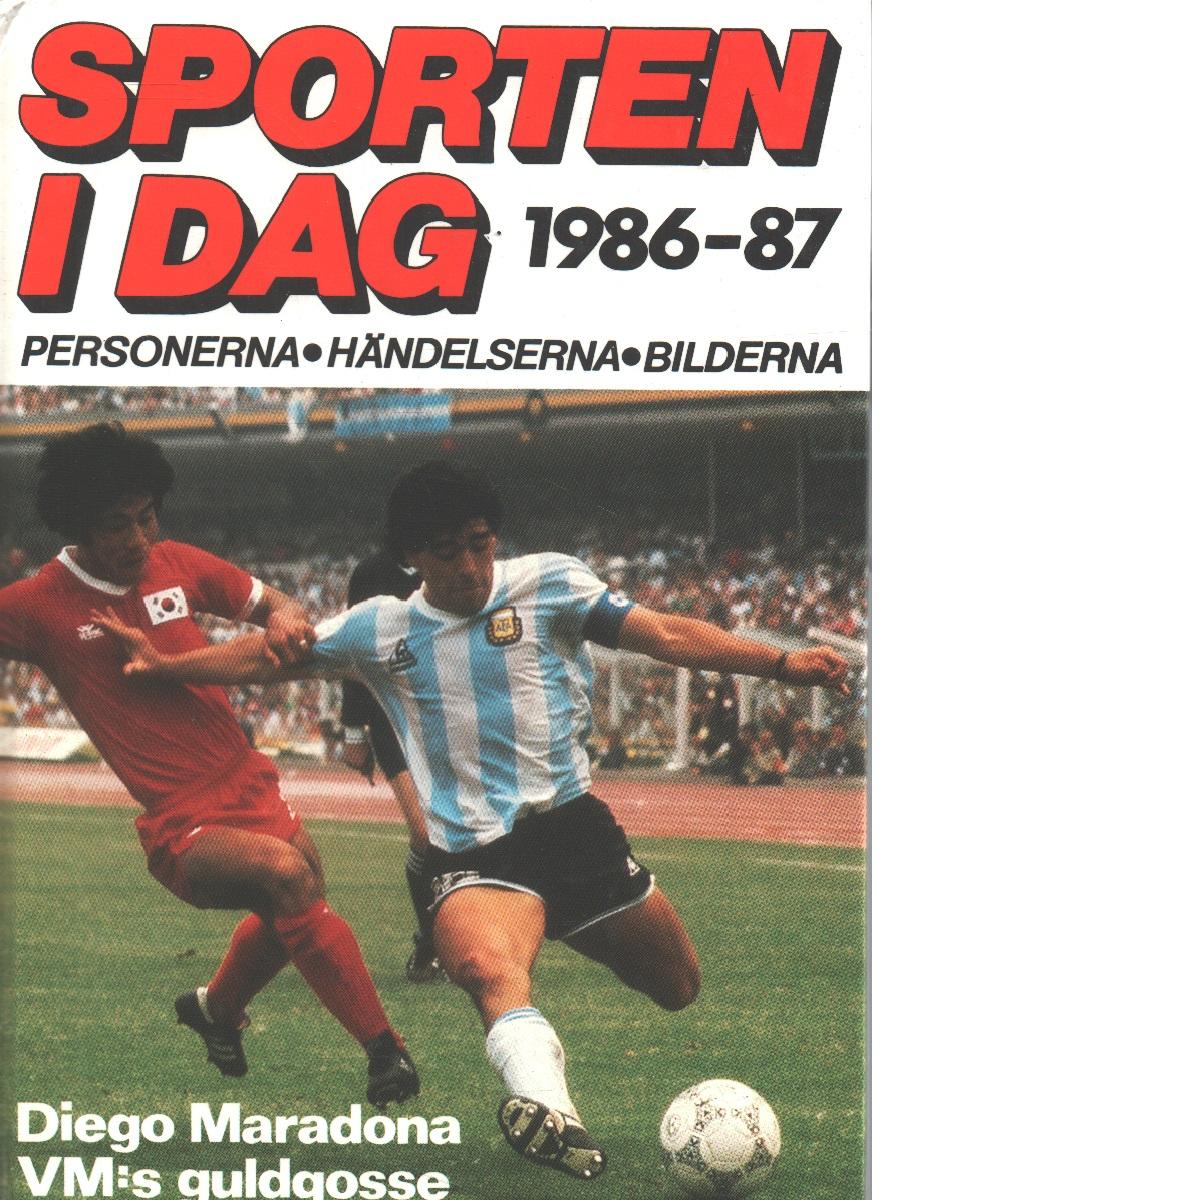 Sporten i dag 1986-87 - Red,